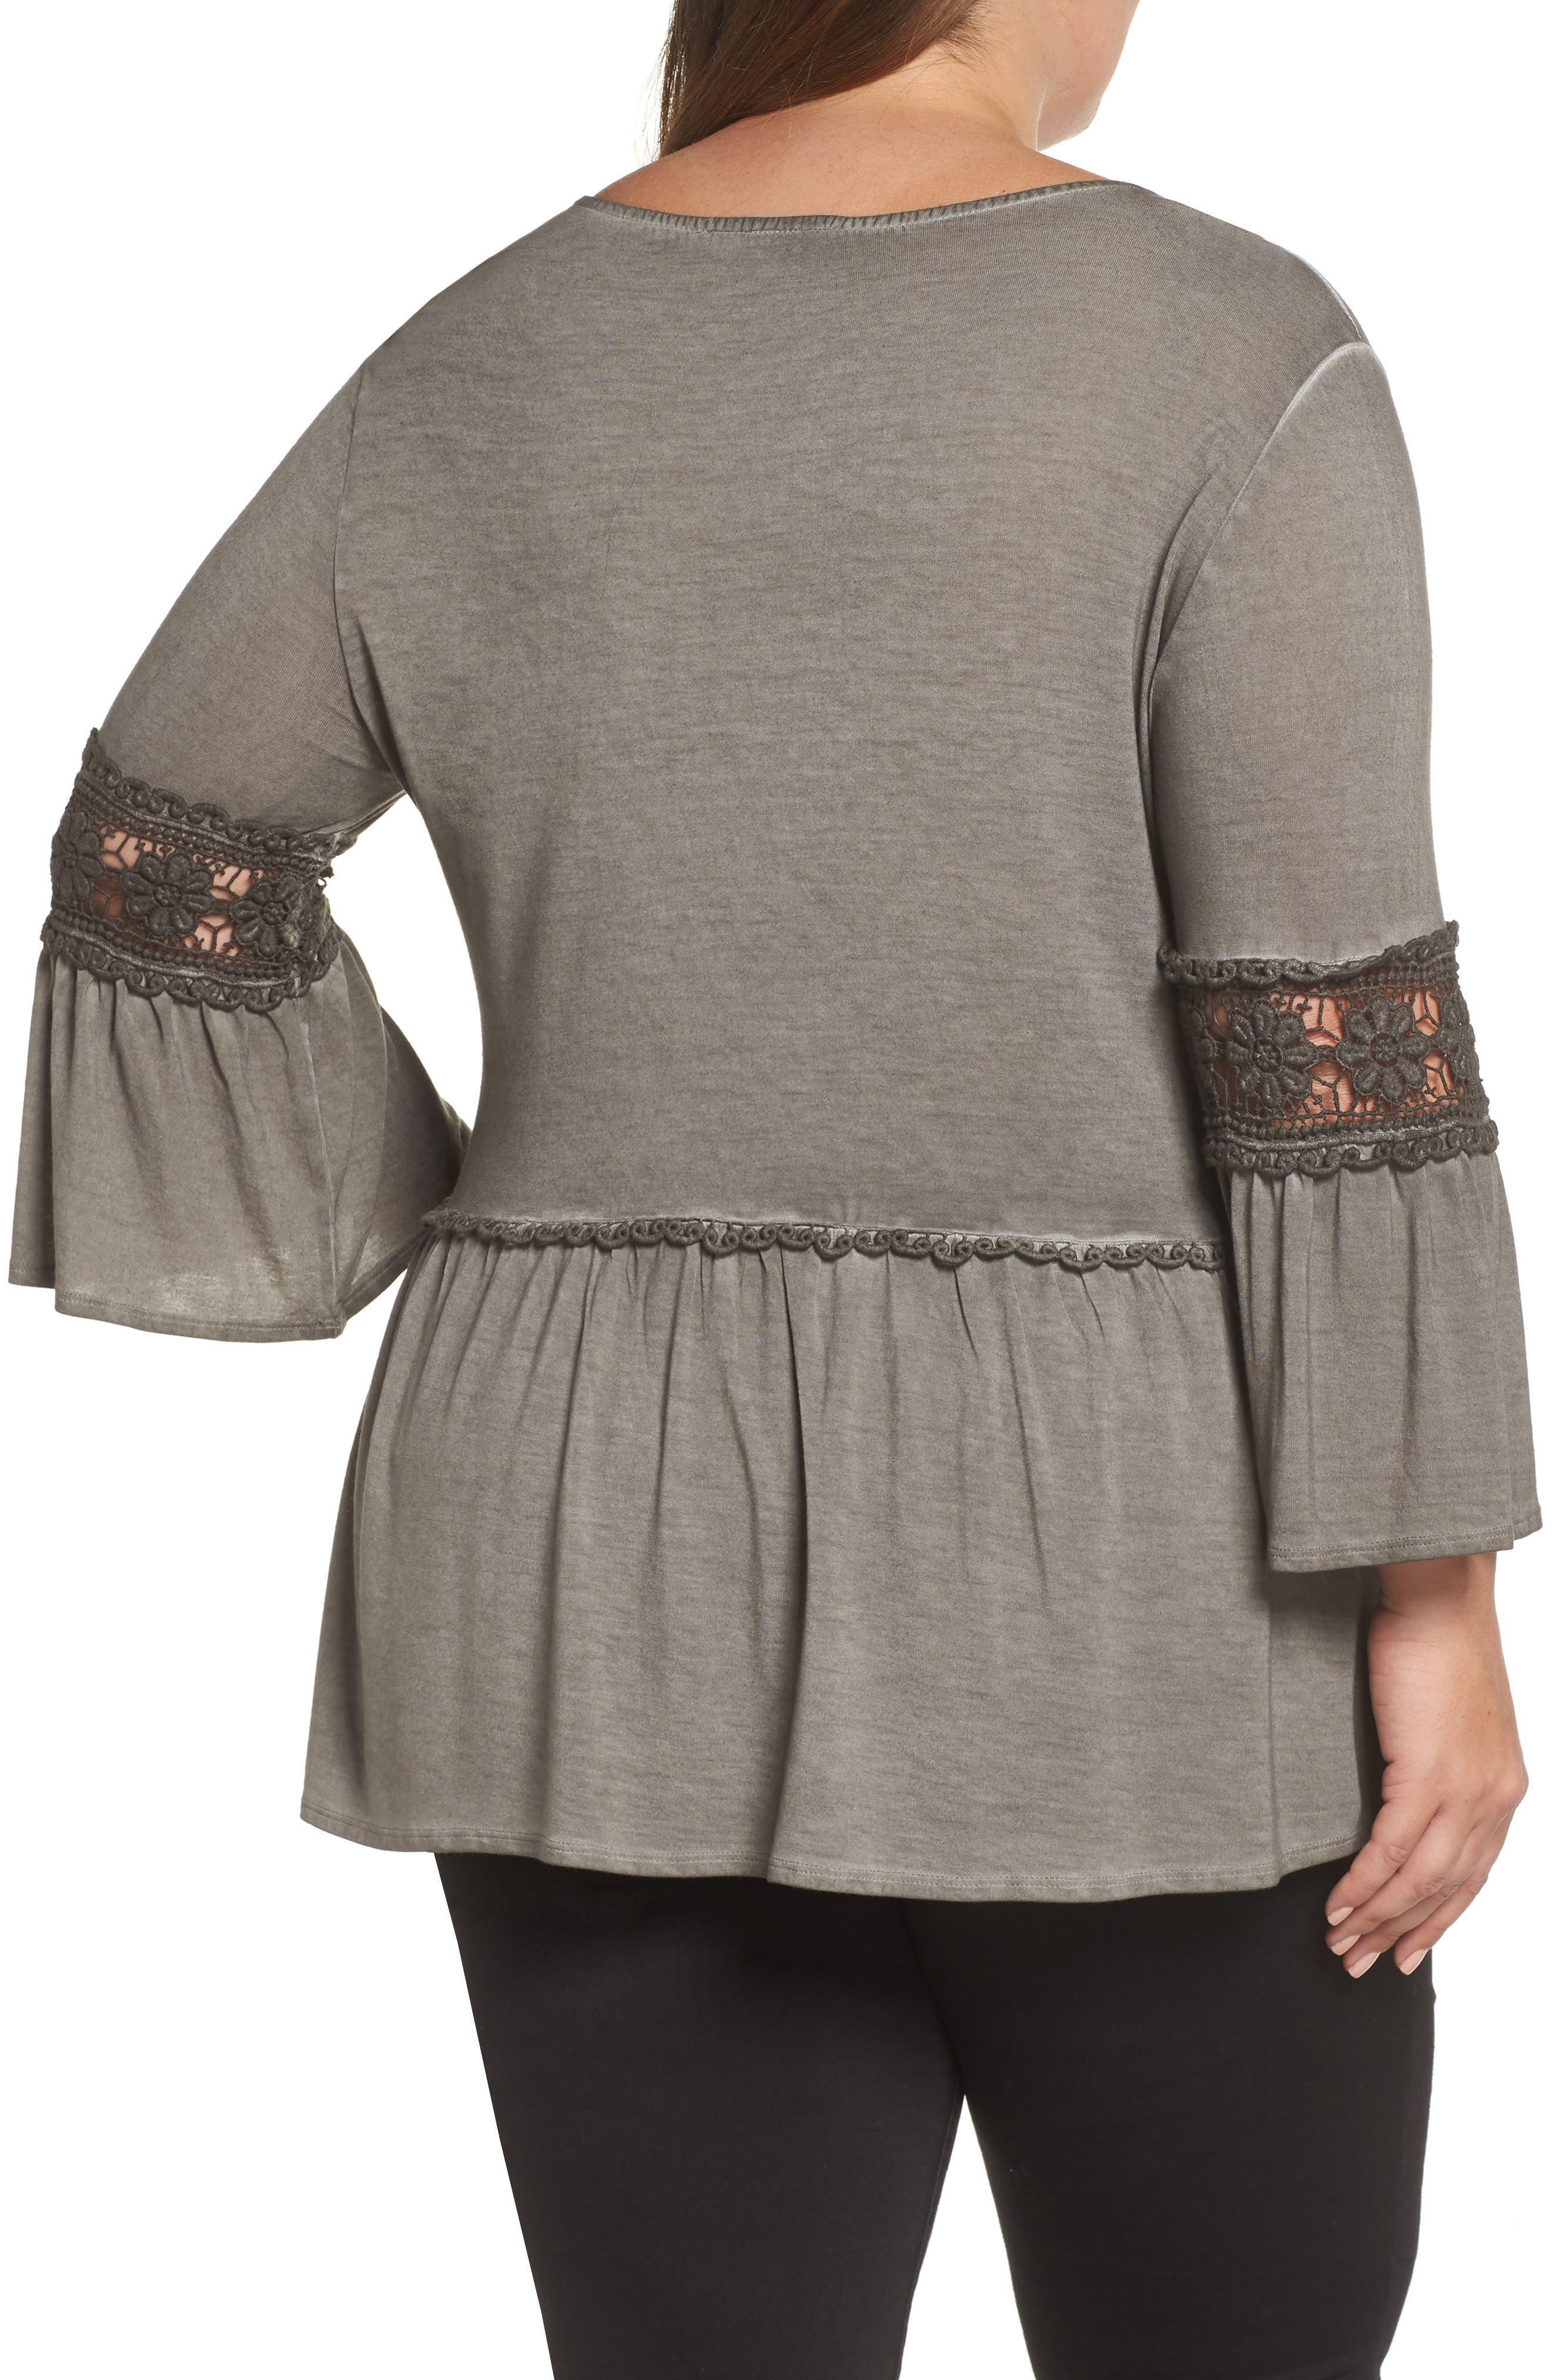 DANTELLE,                             Oil Dye Knit Lace Inset Top,                             Alternate thumbnail 2, color,                             FALCON